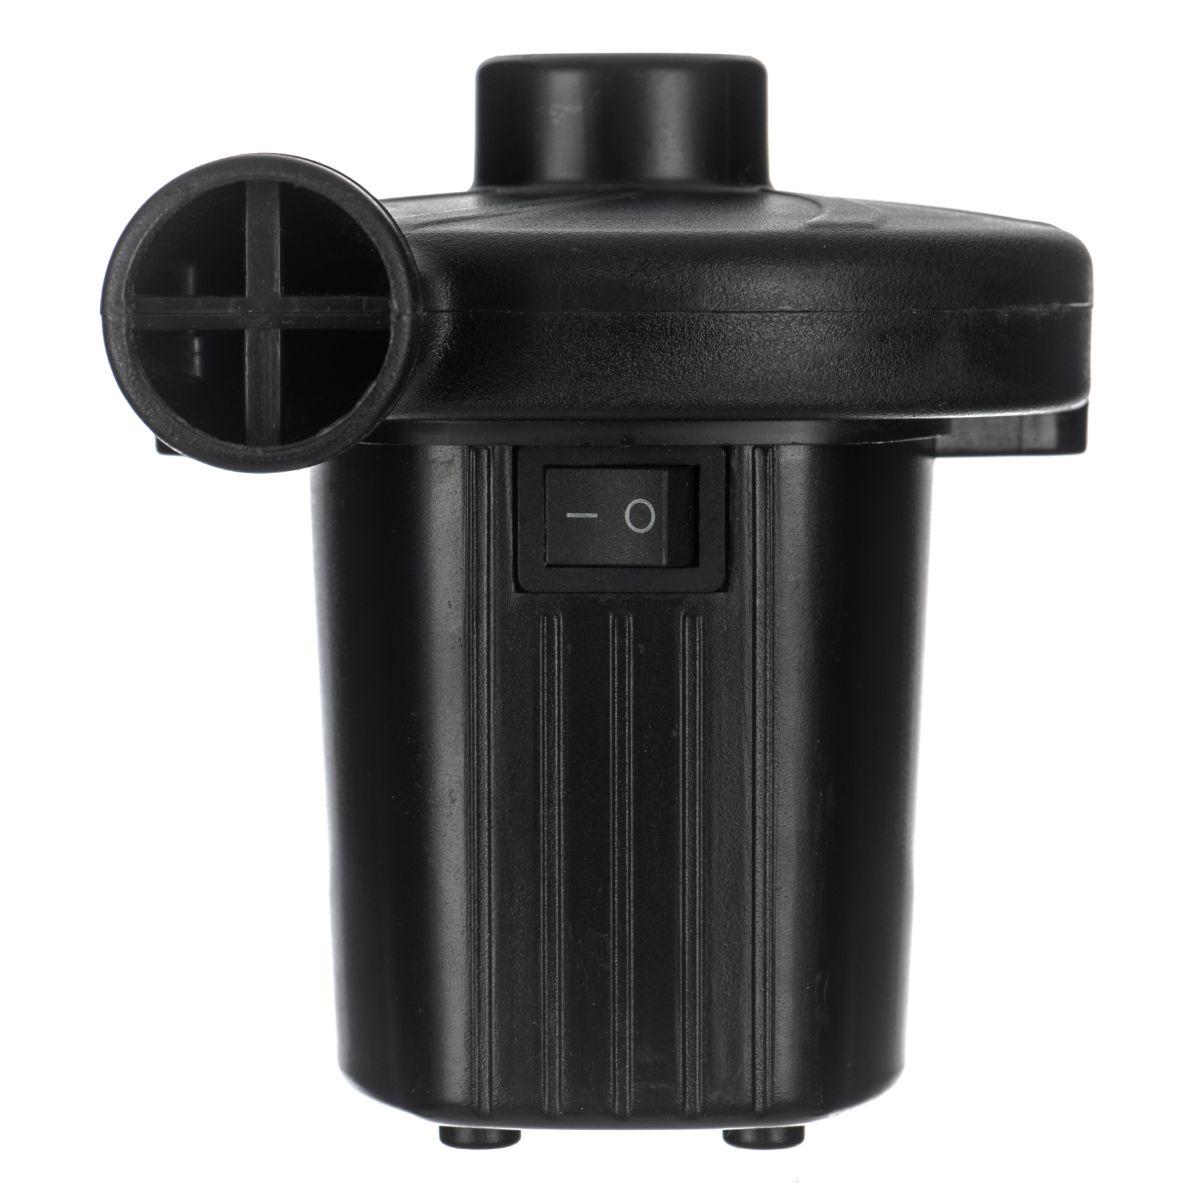 Electric Air Pump for Paddling Pool Fast Inflator Deflator Air Bed Mattress